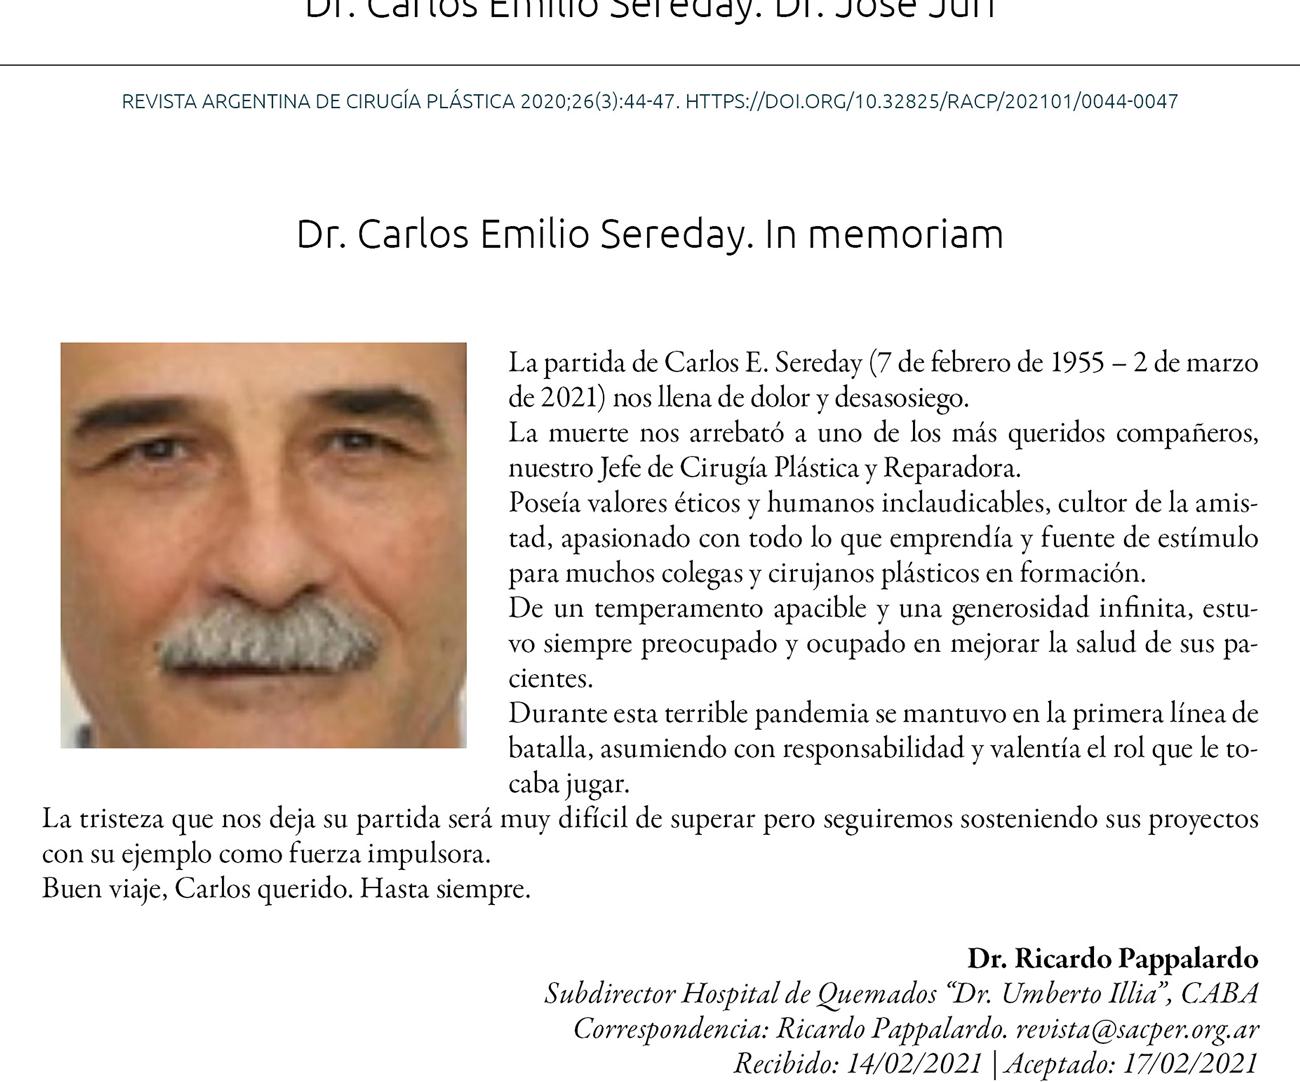 Dr. Carlos Emilio Sereday